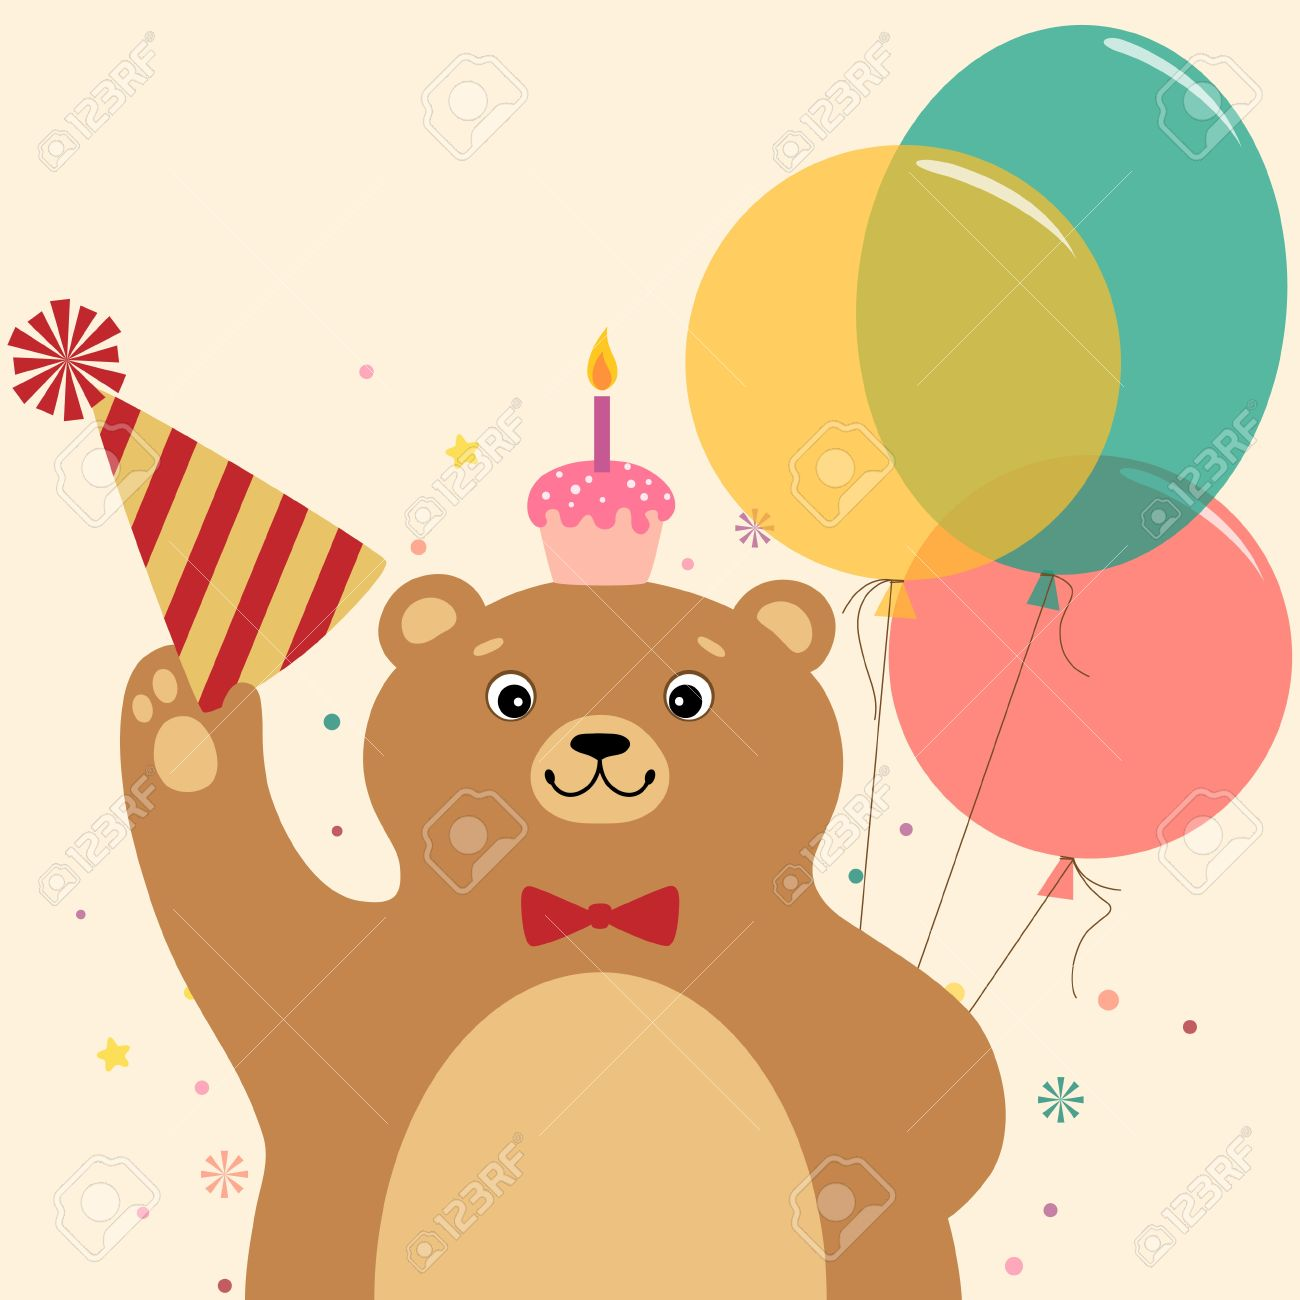 Cute Cartoon Bear With Birthday Cake Vector Contains Transparent